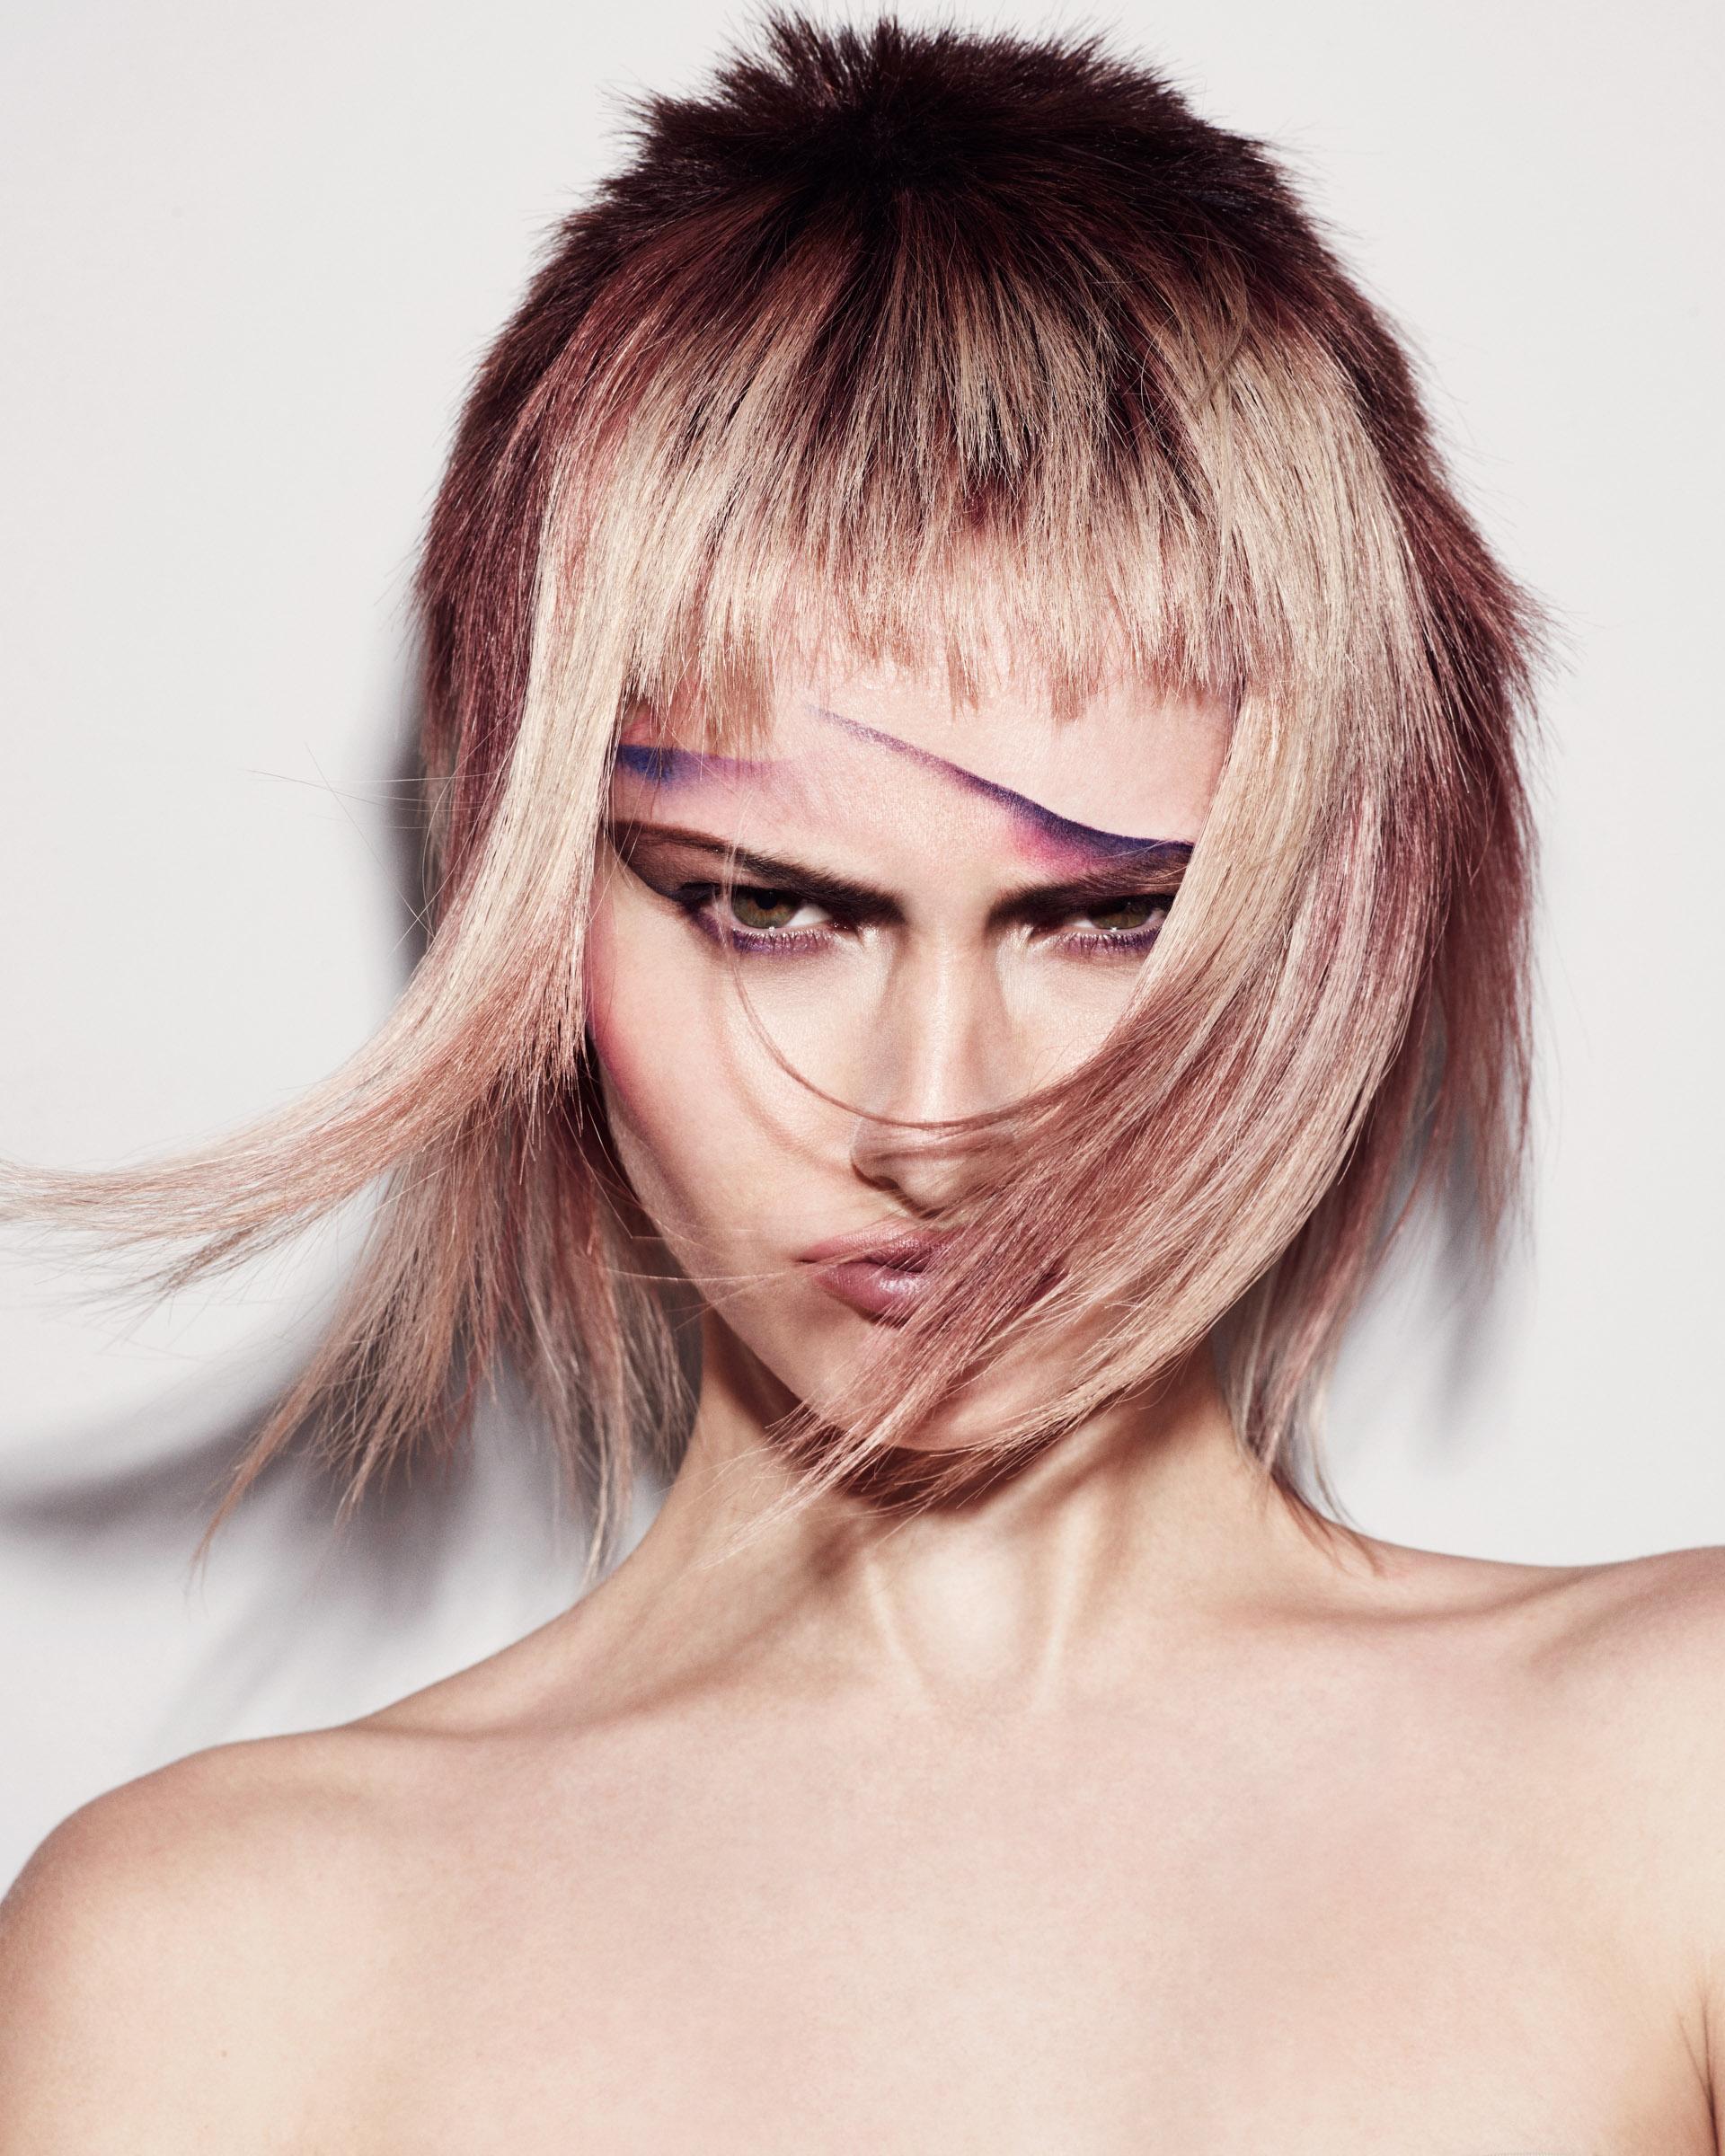 Jack_Eames_Hooker_Young_Colour_Pop_Hair_Beauty_MakeUp_Photography_London_06.jpg